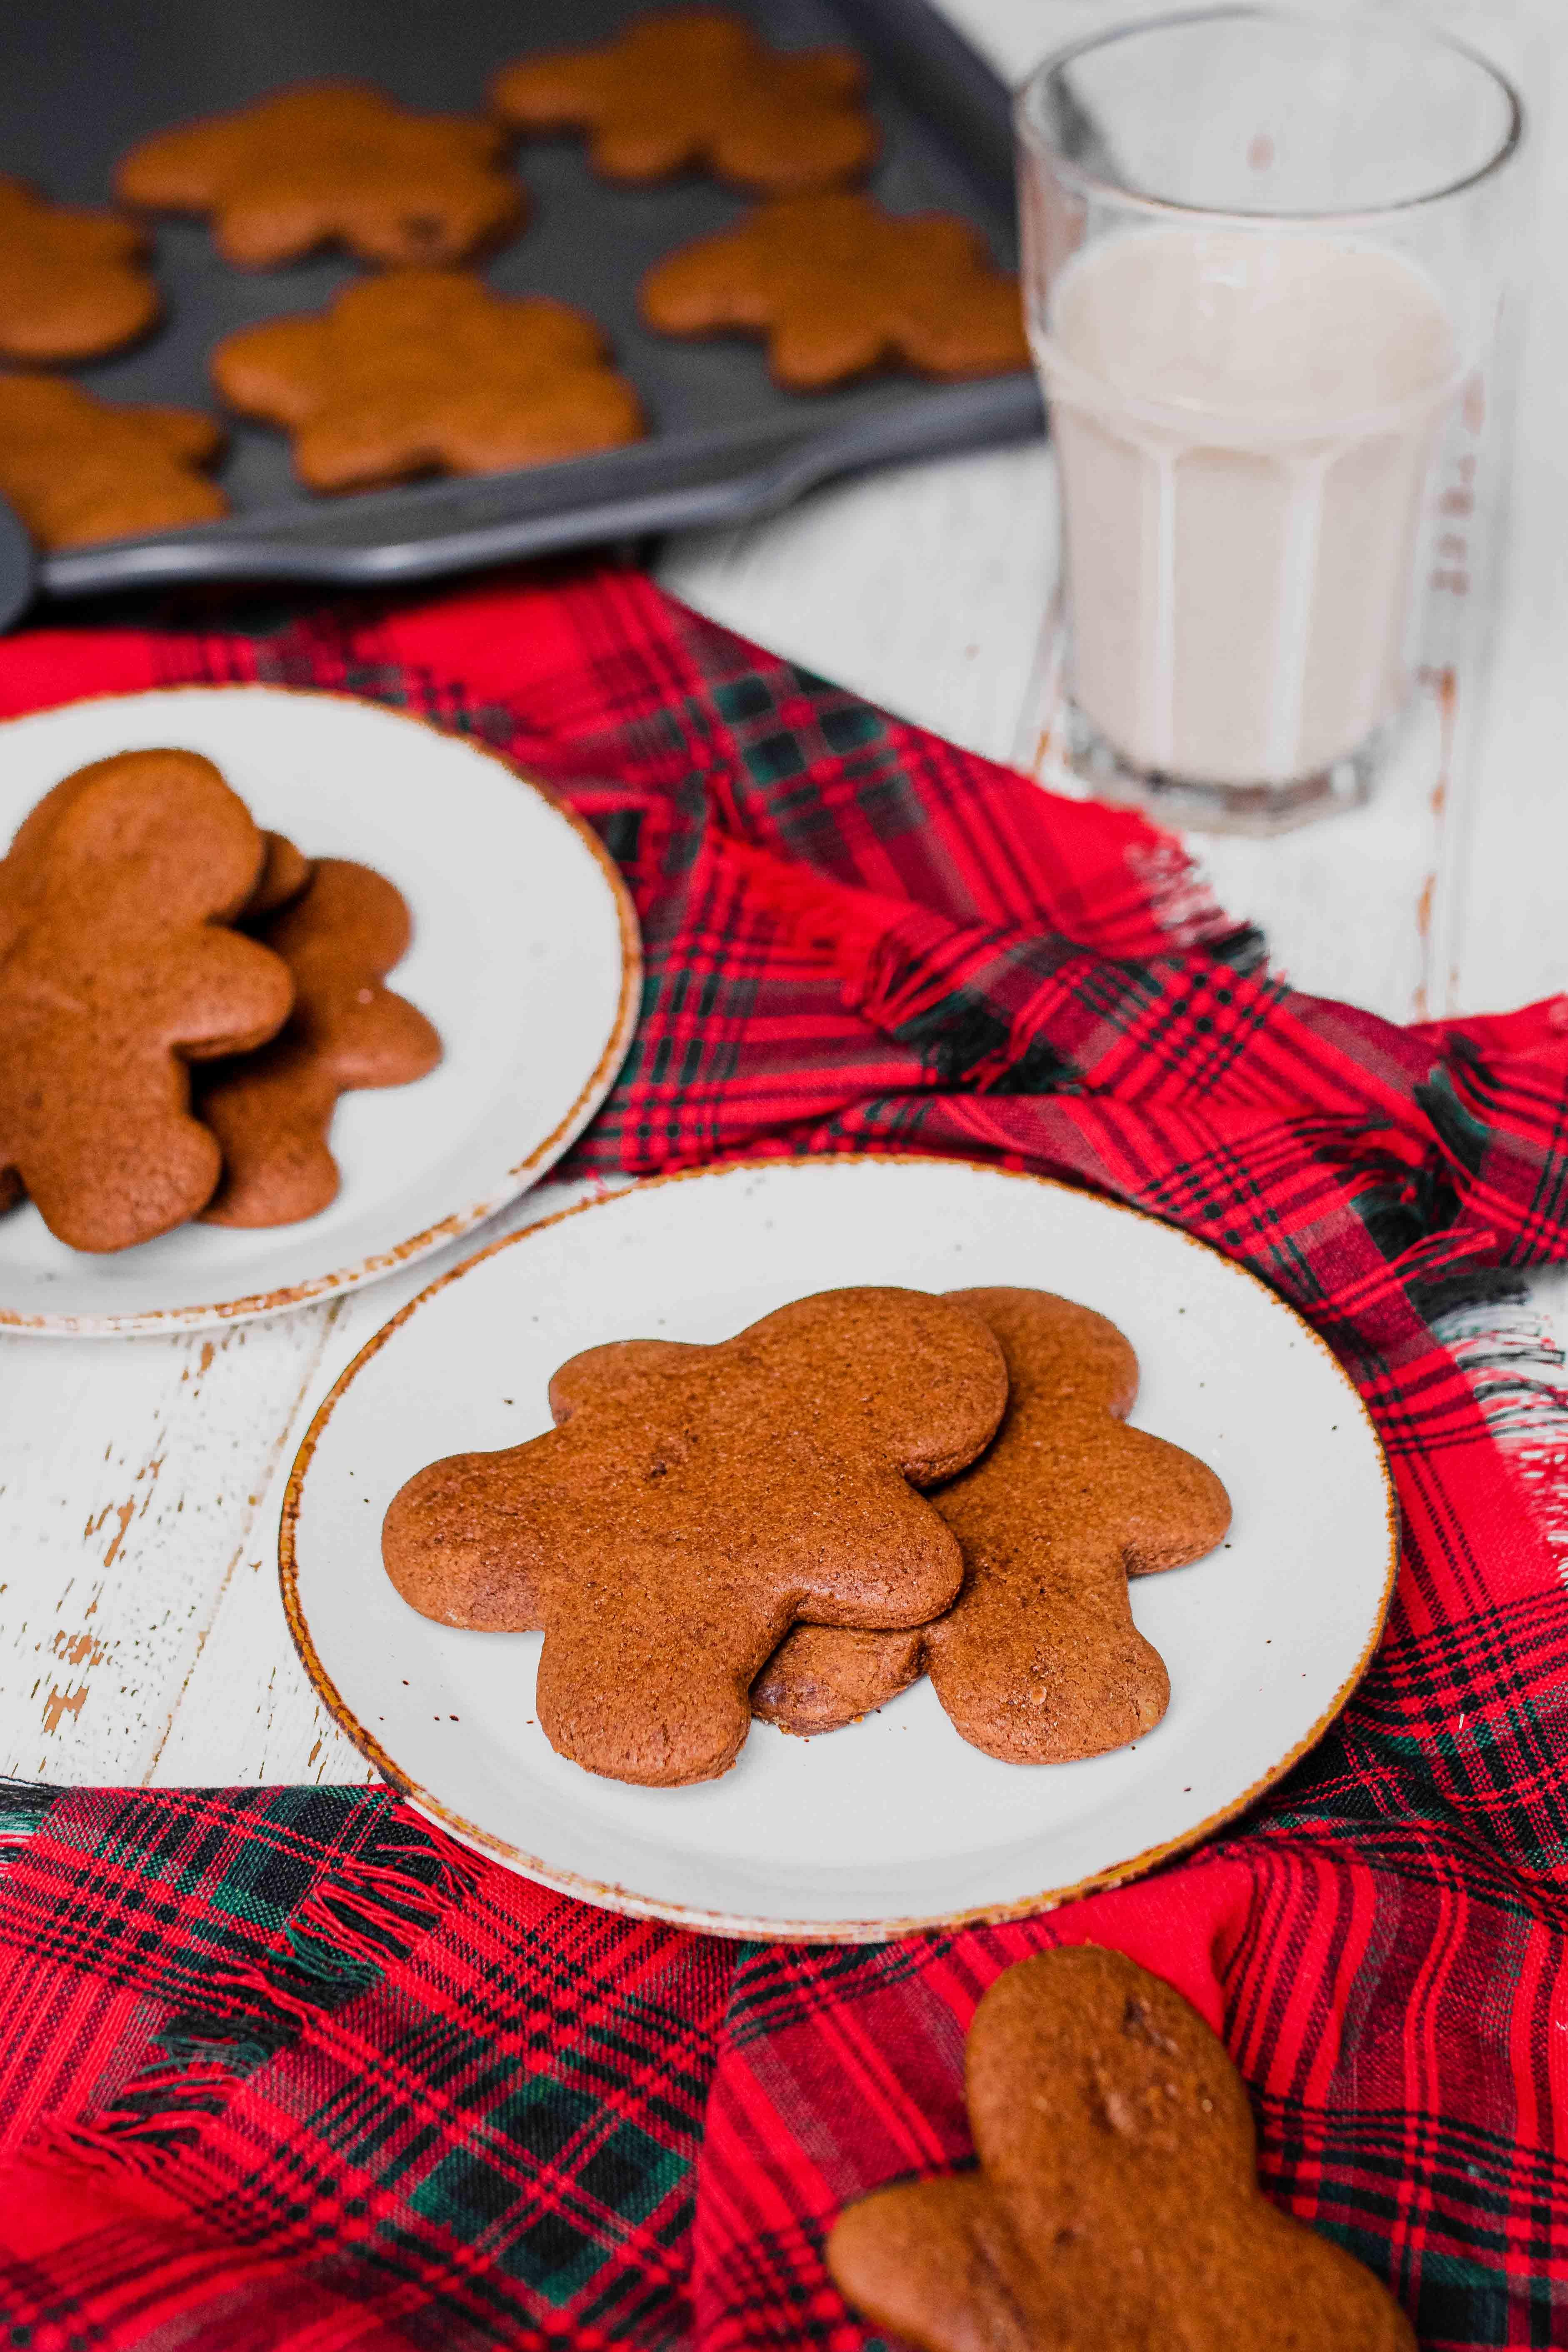 gingerbread people cookies with milk